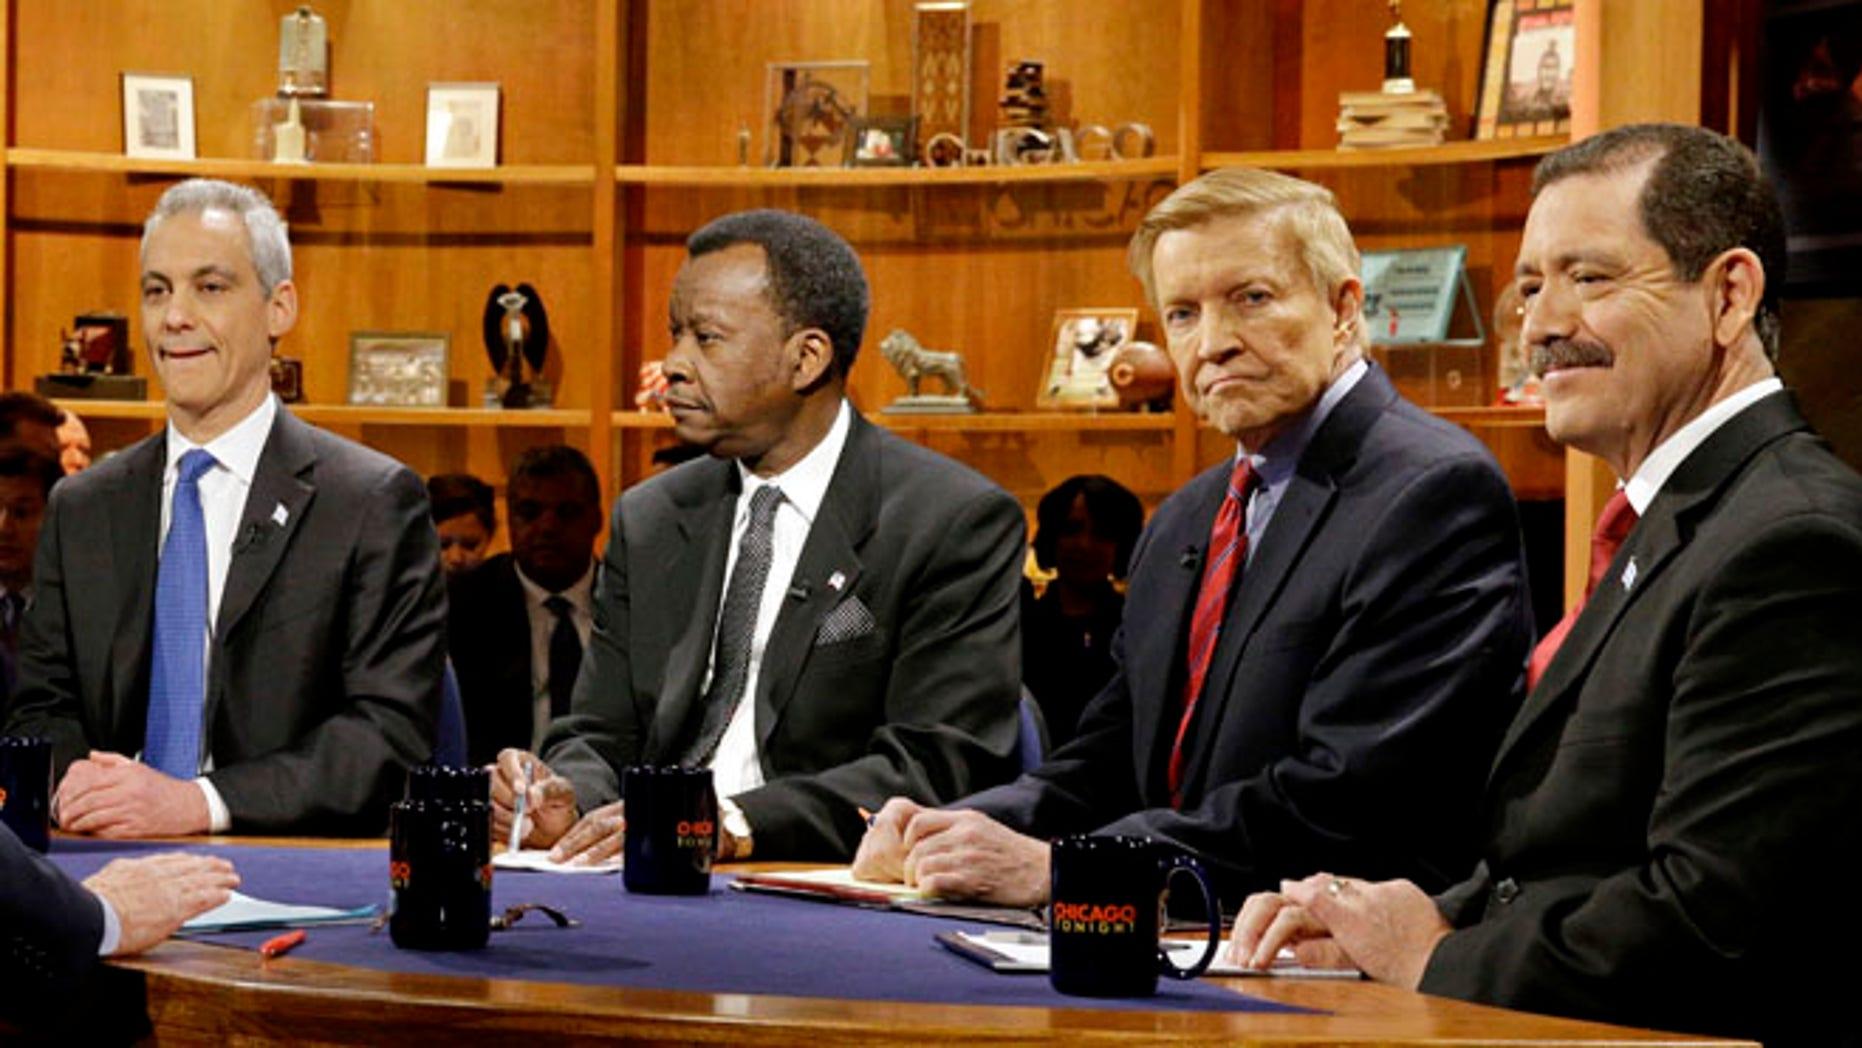 FILE: Feb. 4, 2015:  from left, Chicago Mayor Rahm Emanuel, businessman Willie Wilson, Alderman Bob Fioretti, Cook County Commissioner Jesus Garcia in Chicago, Ill.